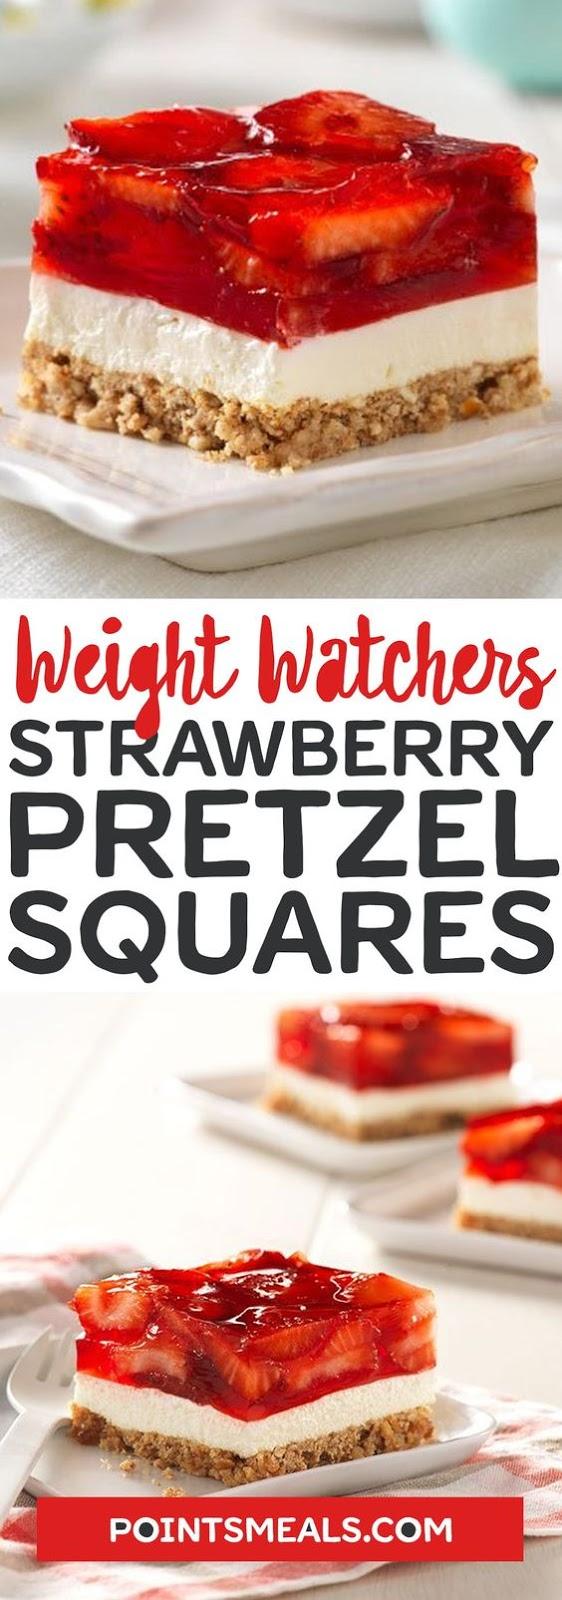 Strawberry Pretzel Salad Squares